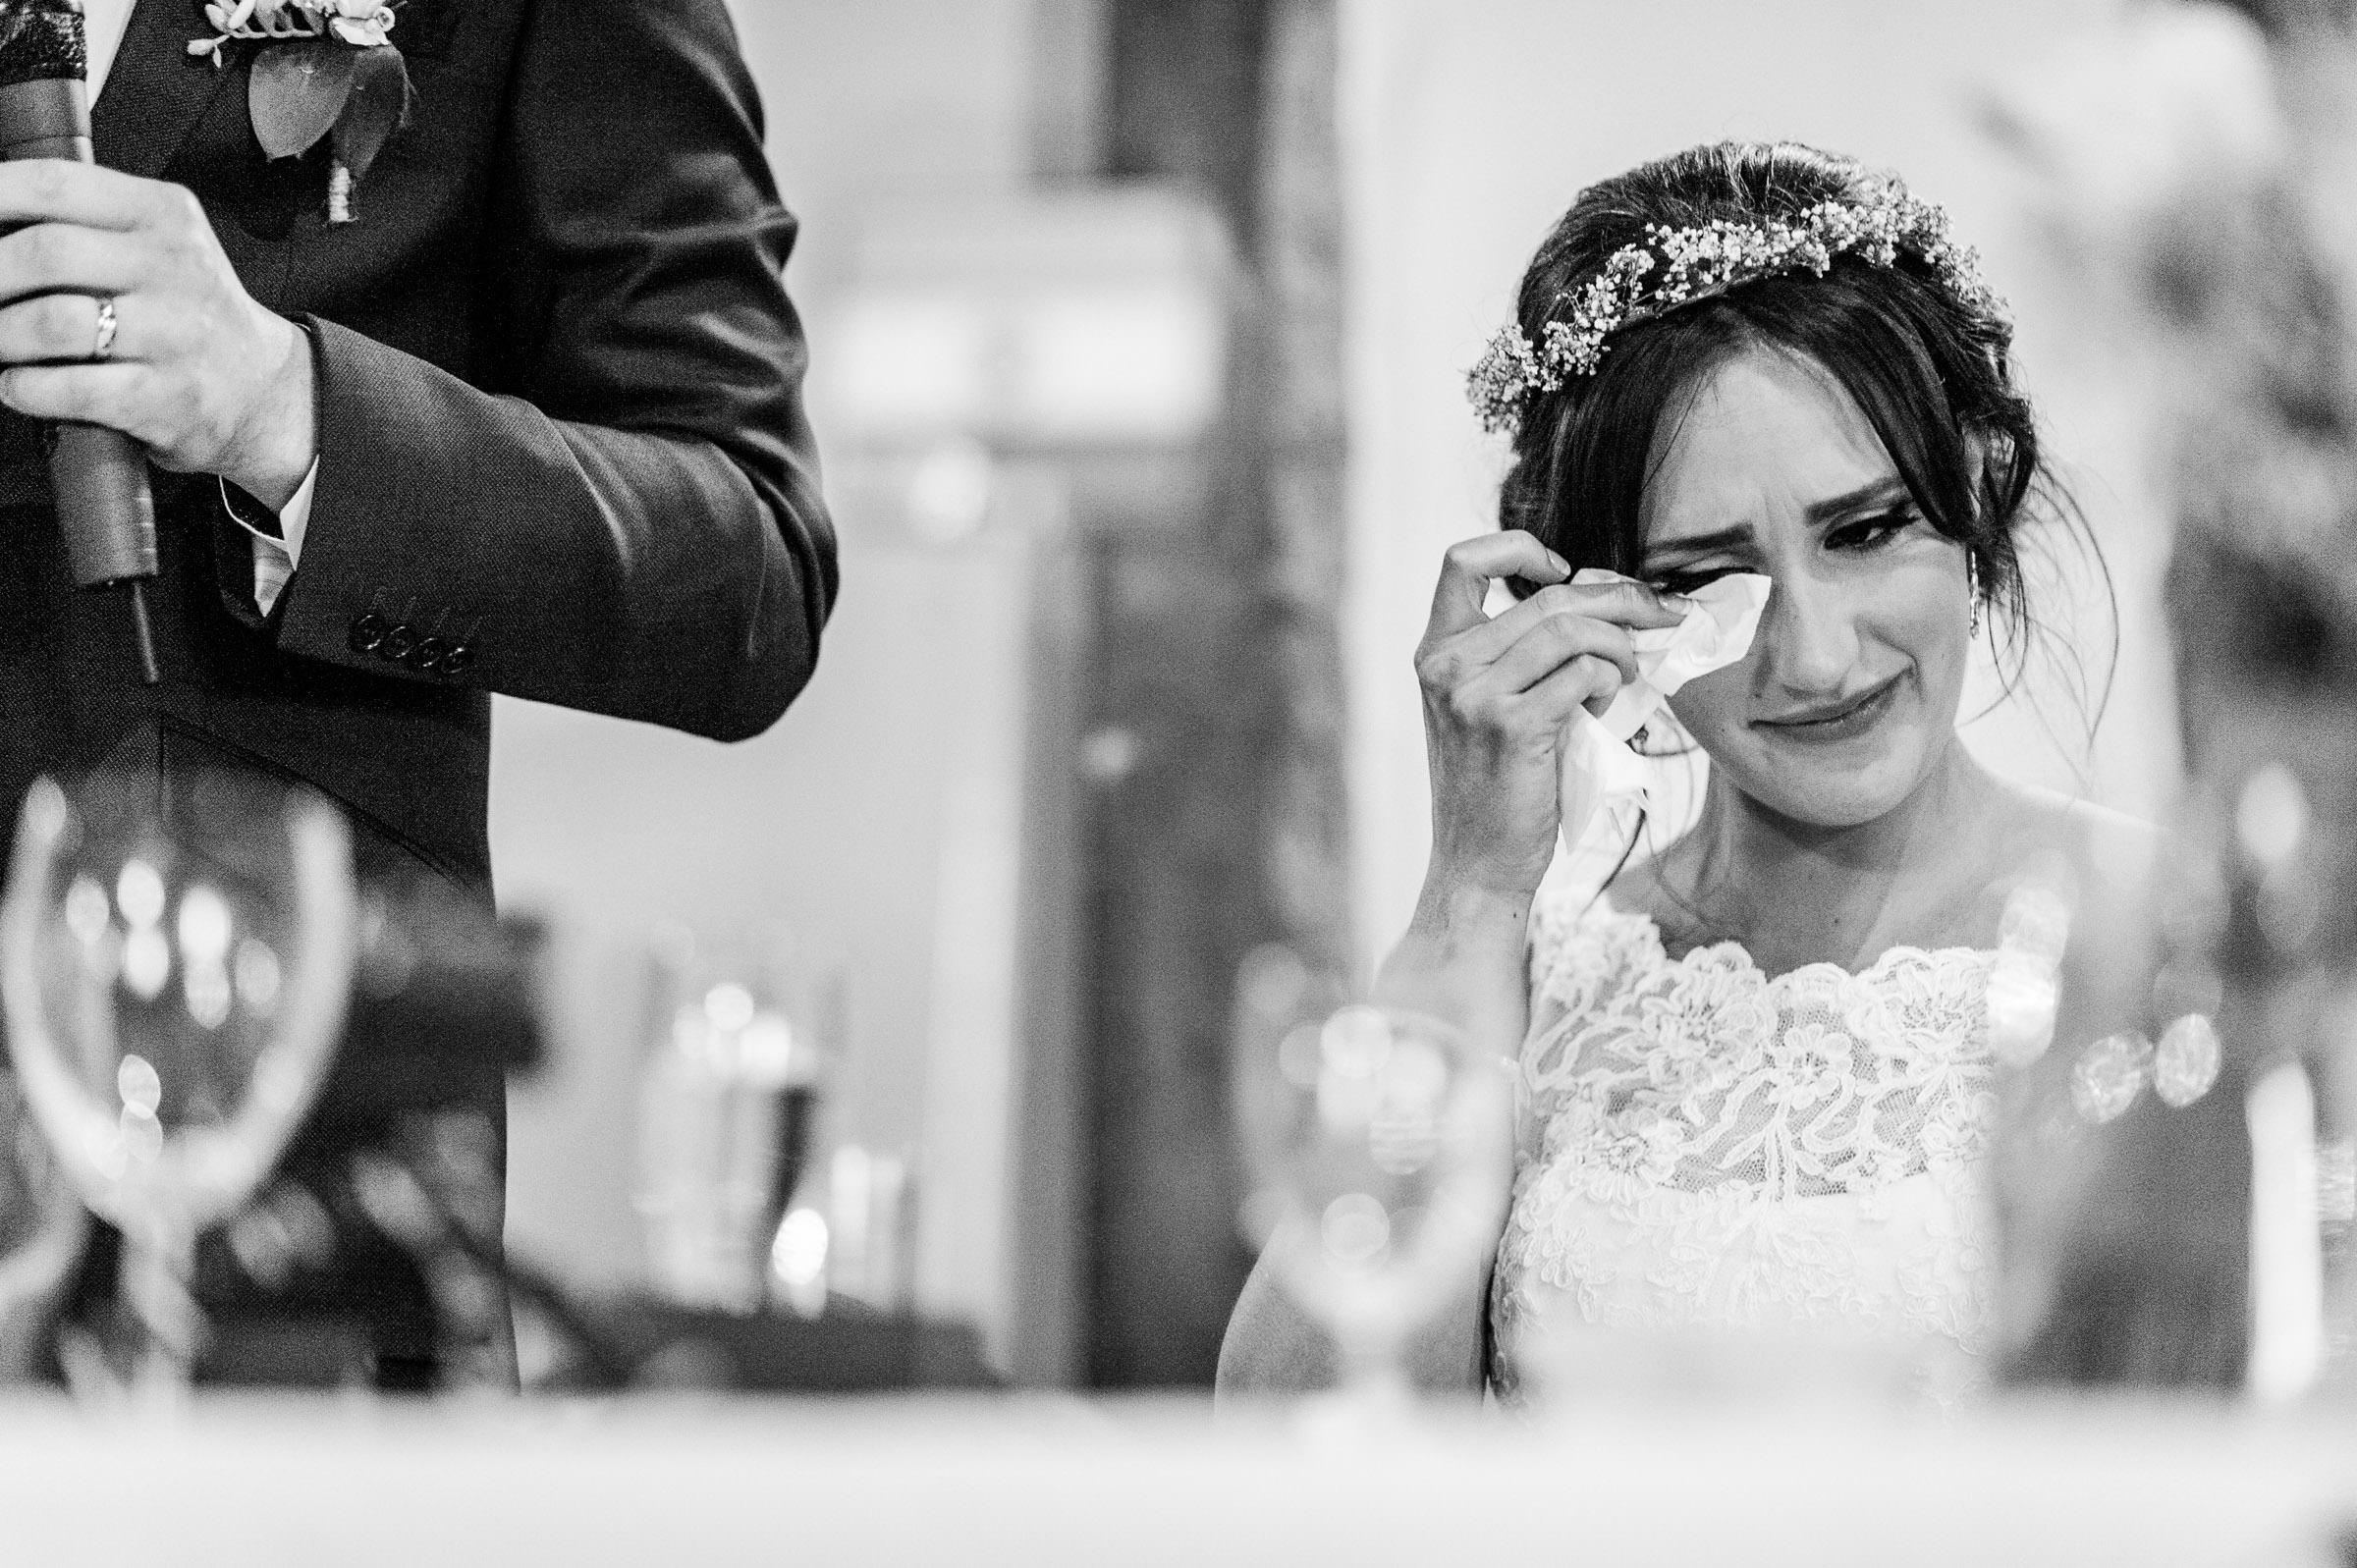 Notley Tythe Barn Reportage Wedding Photos 028.jpg